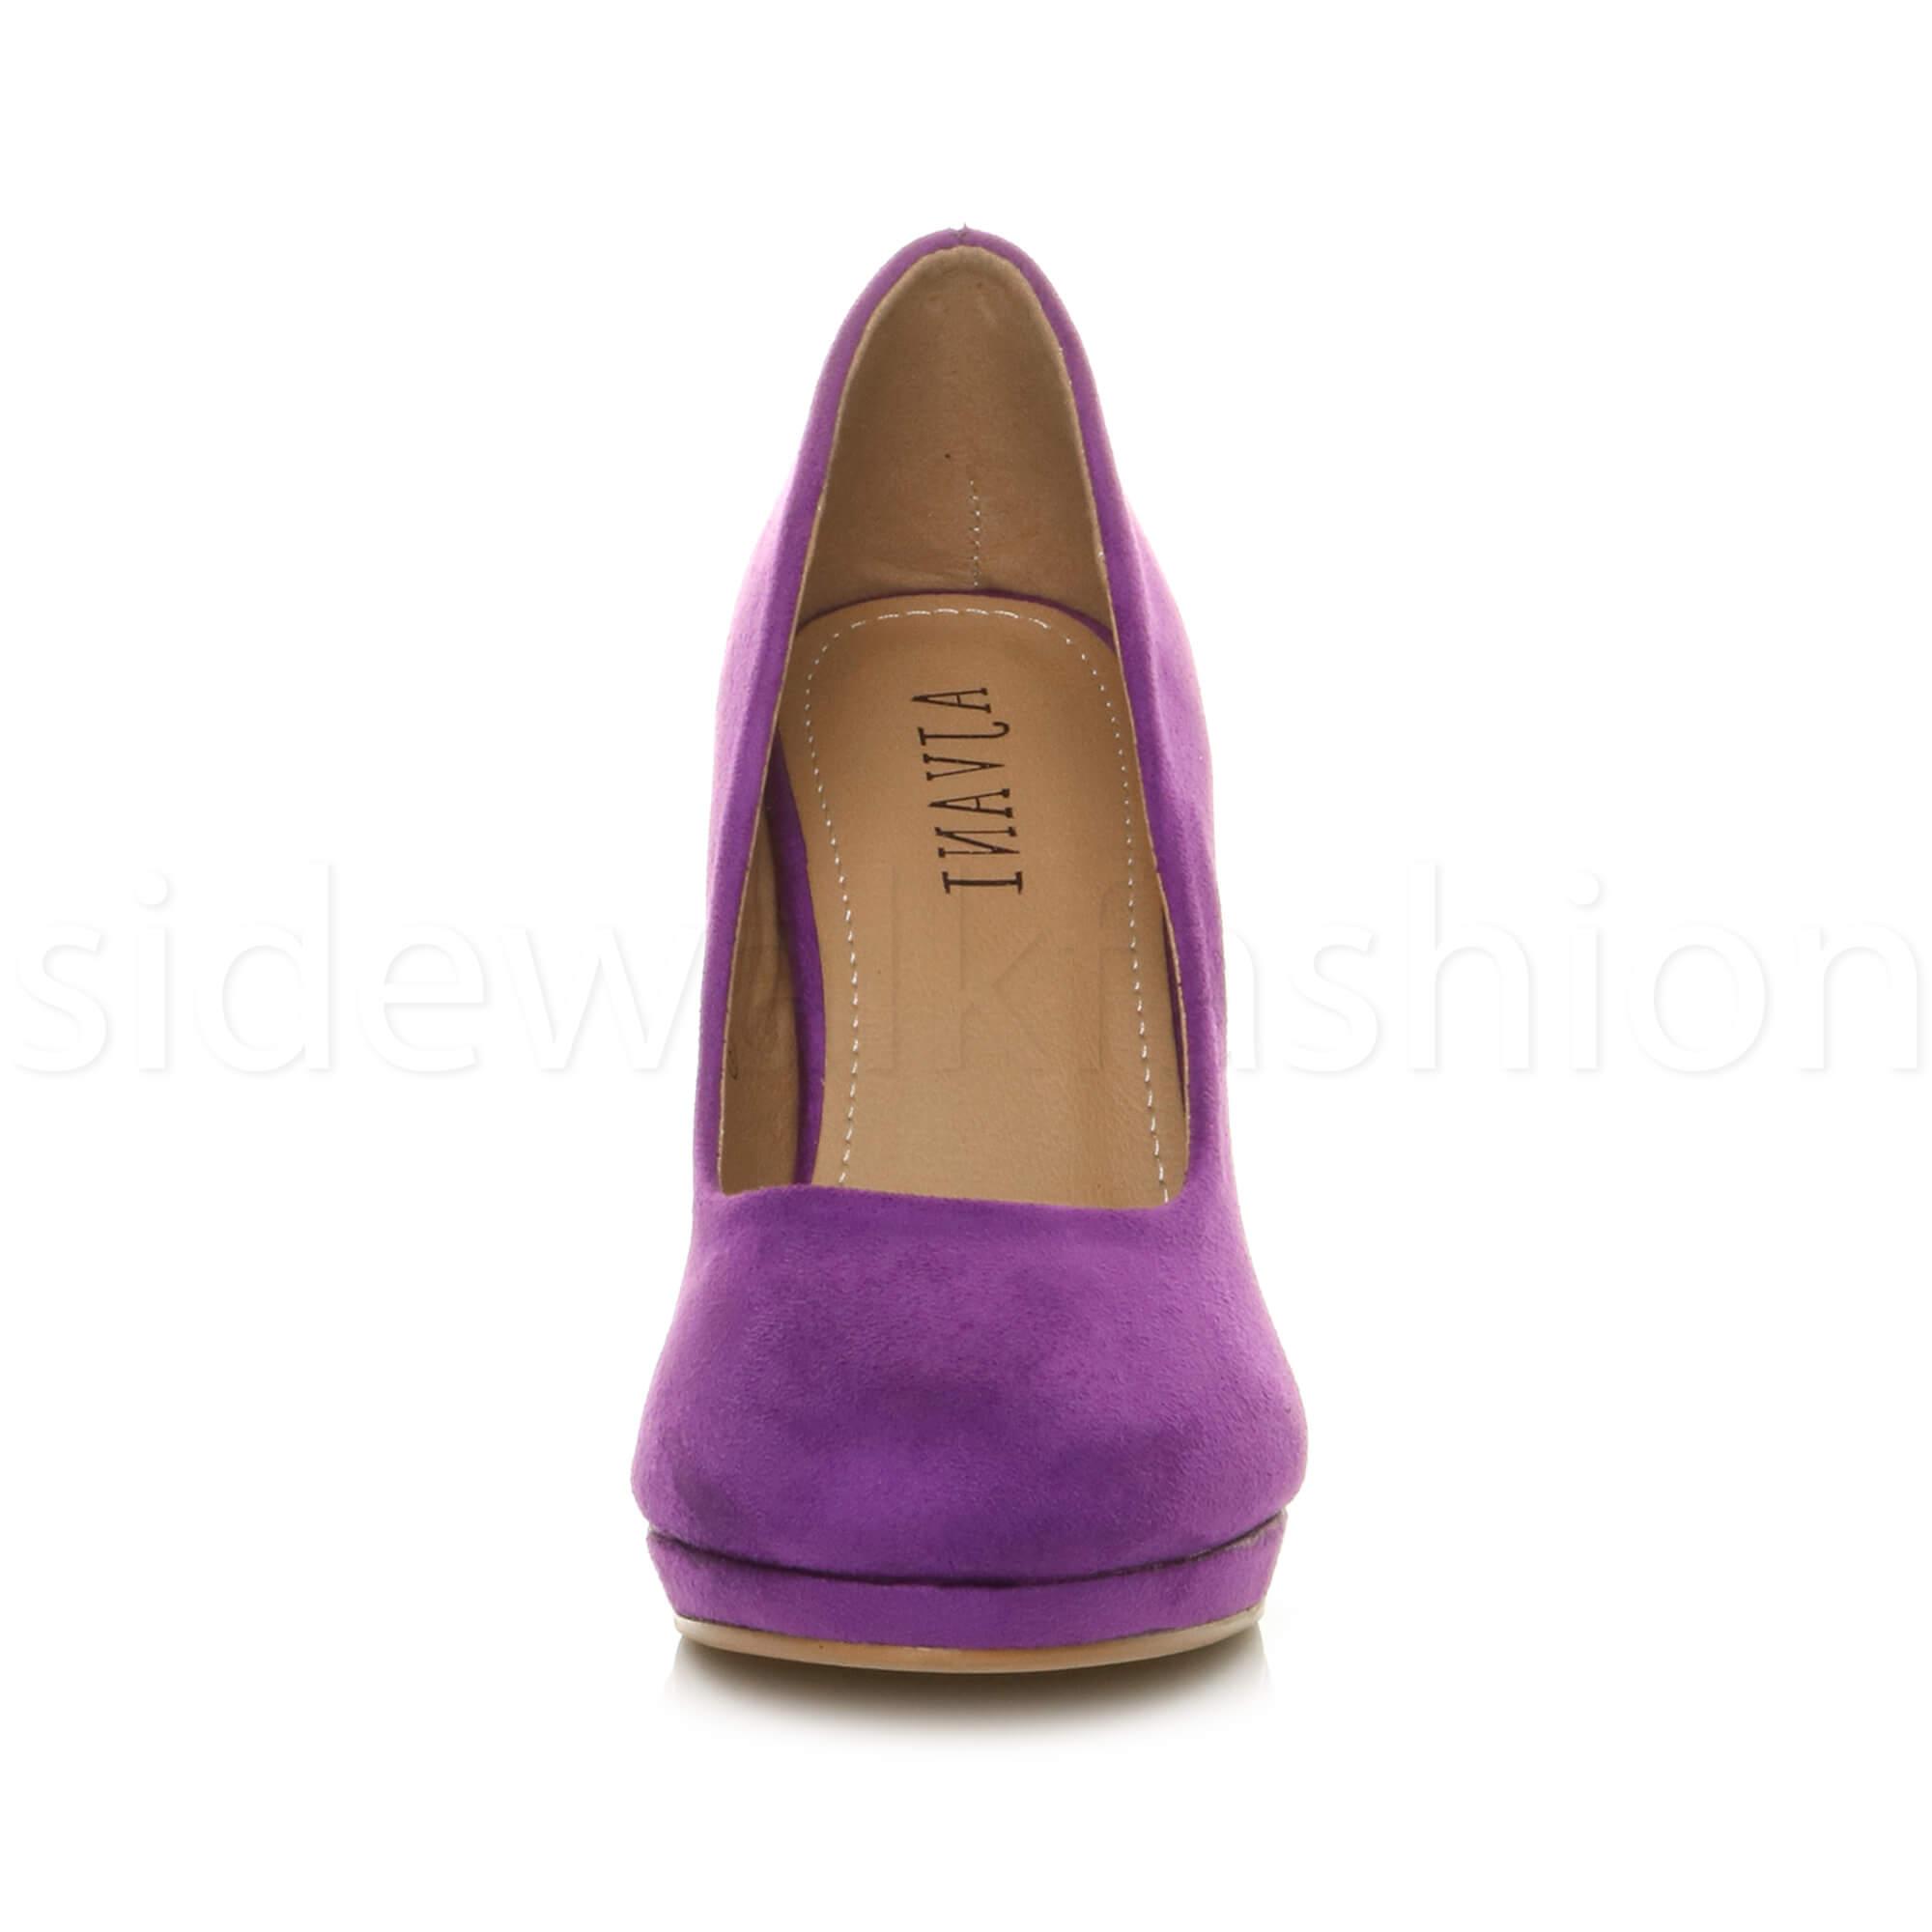 Womens-ladies-high-mid-heel-platform-wedding-evening-bridesmaid-court-shoes-size thumbnail 139